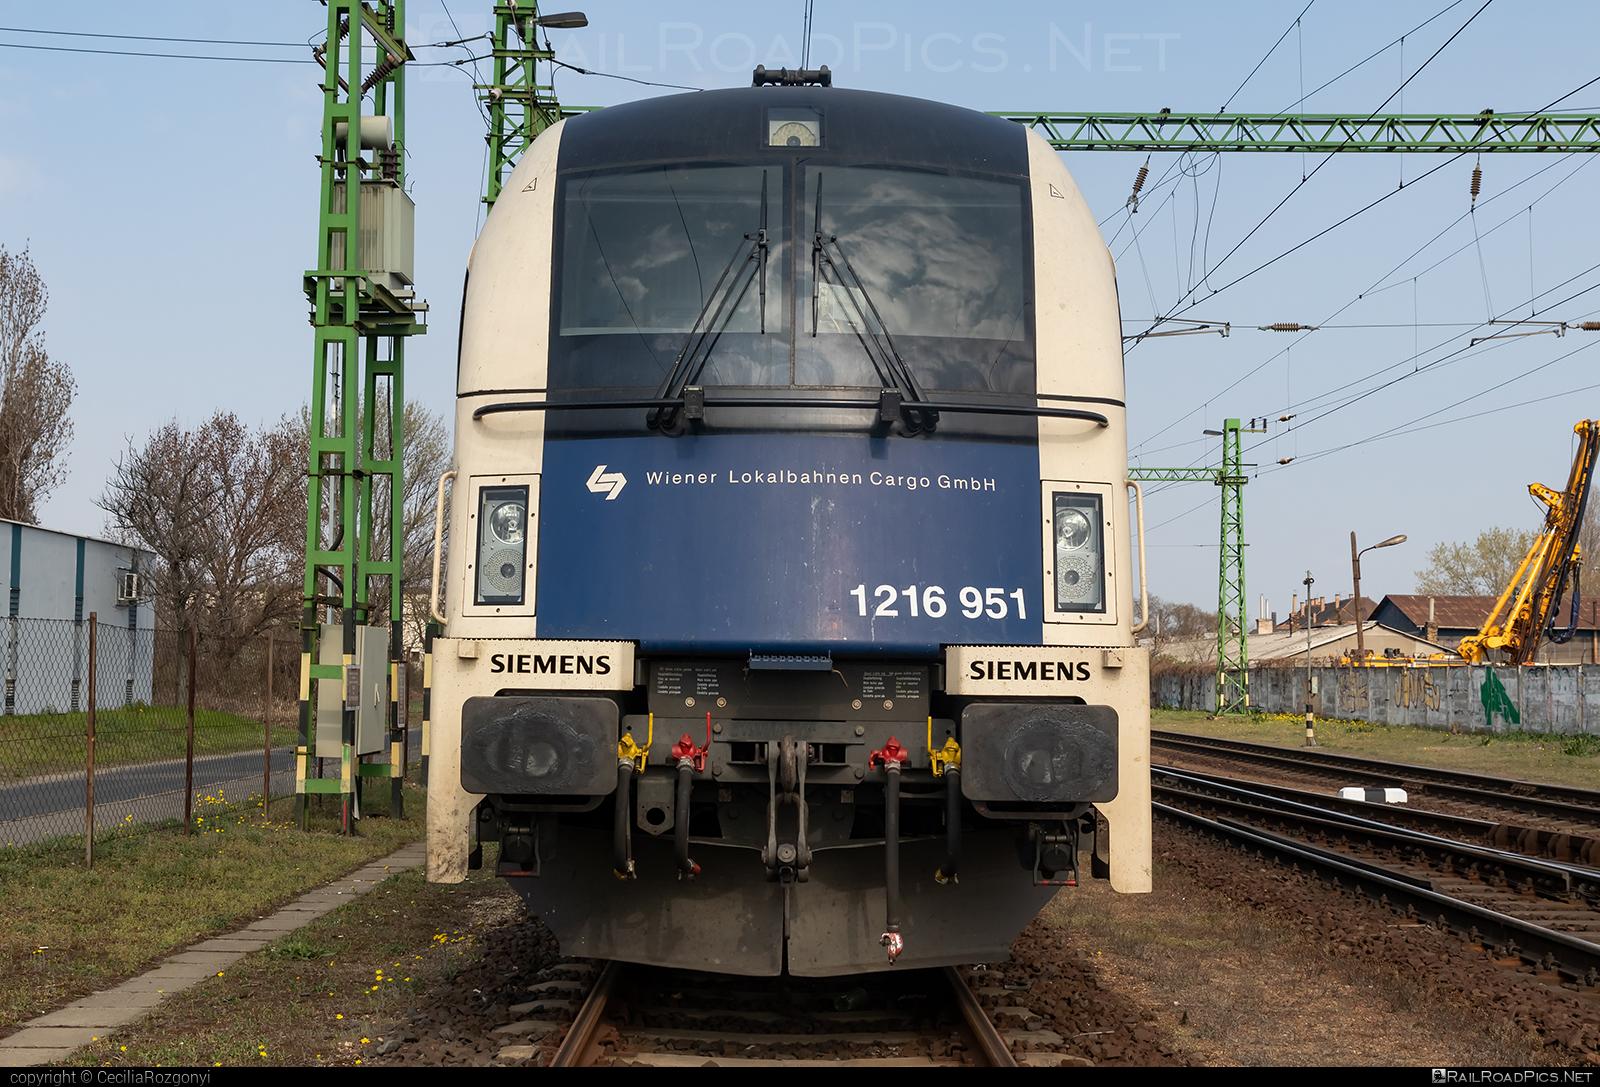 Siemens ES 64 U4 - 1216 951 operated by Wiener Lokalbahnen Cargo GmbH #es64 #es64u #es64u4 #eurosprinter #siemens #siemenses64 #siemenses64u #siemenses64u4 #siemenstaurus #taurus #tauruslocomotive #wienerlokalbahnencargo #wienerlokalbahnencargogmbh #wlc